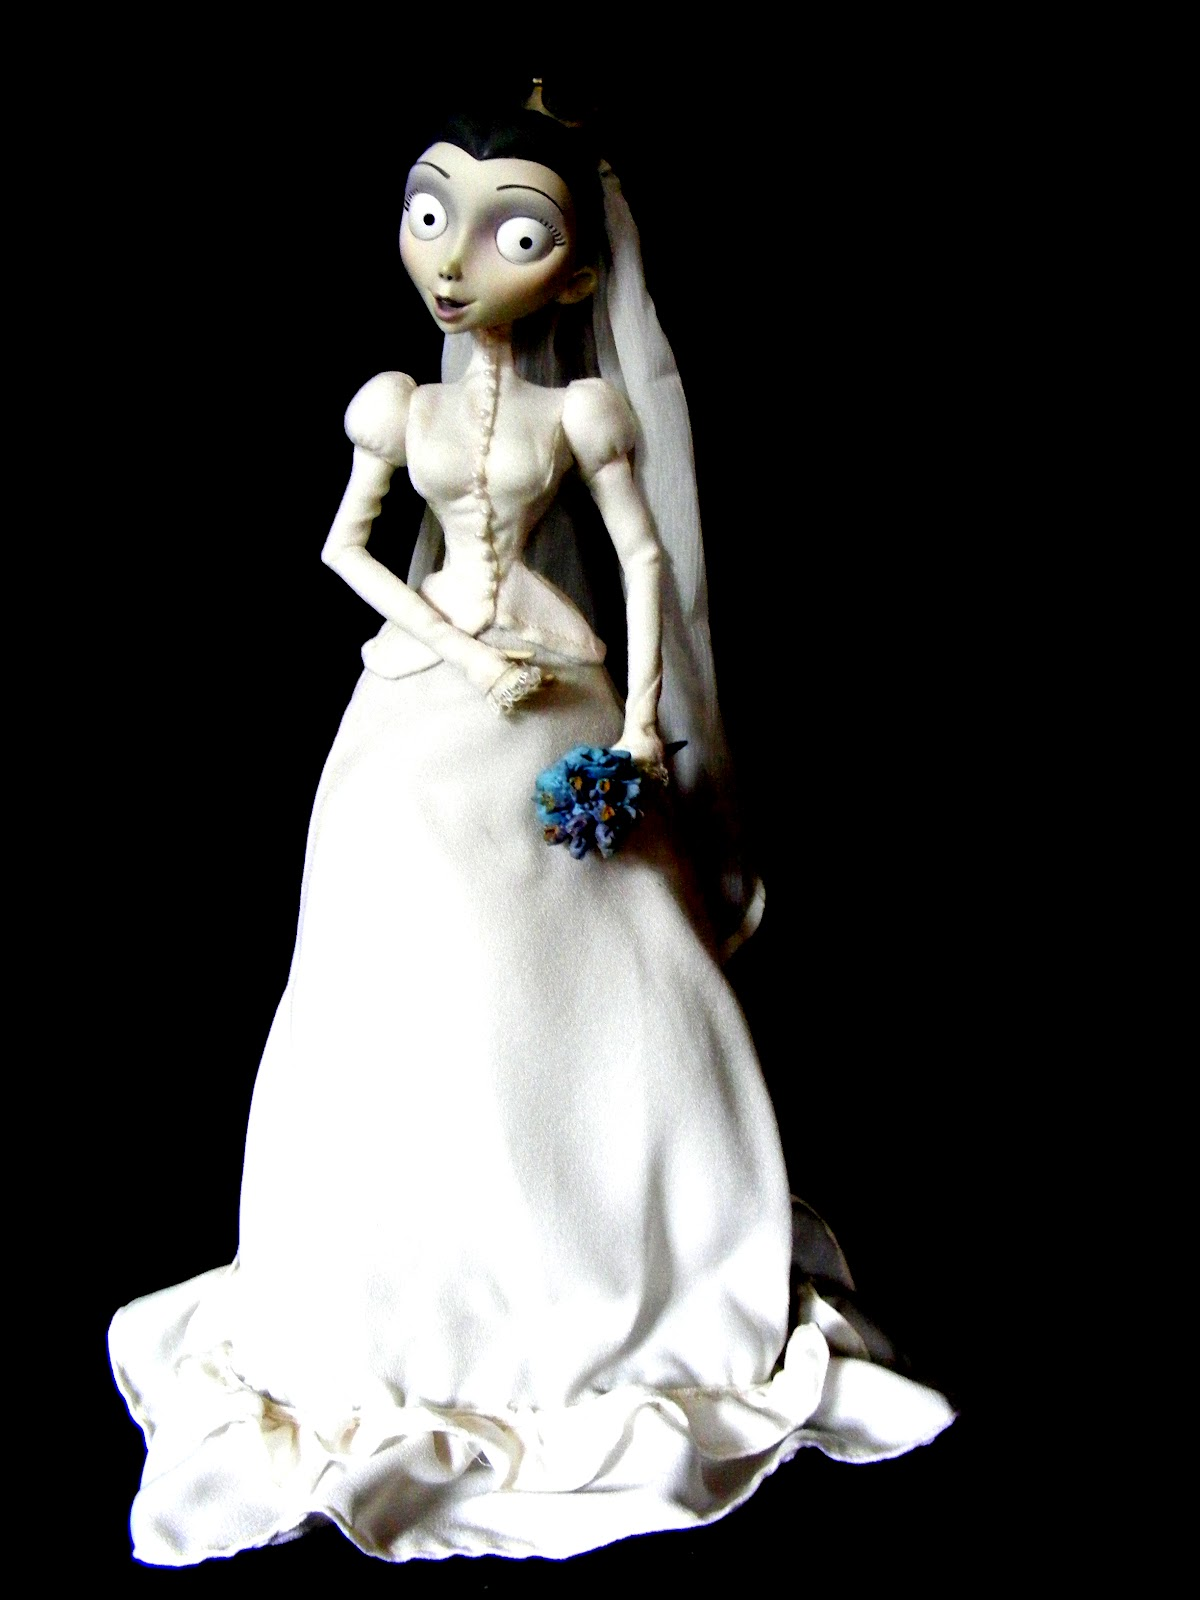 Daniel James Animations Corpse Bride Photo Shoot